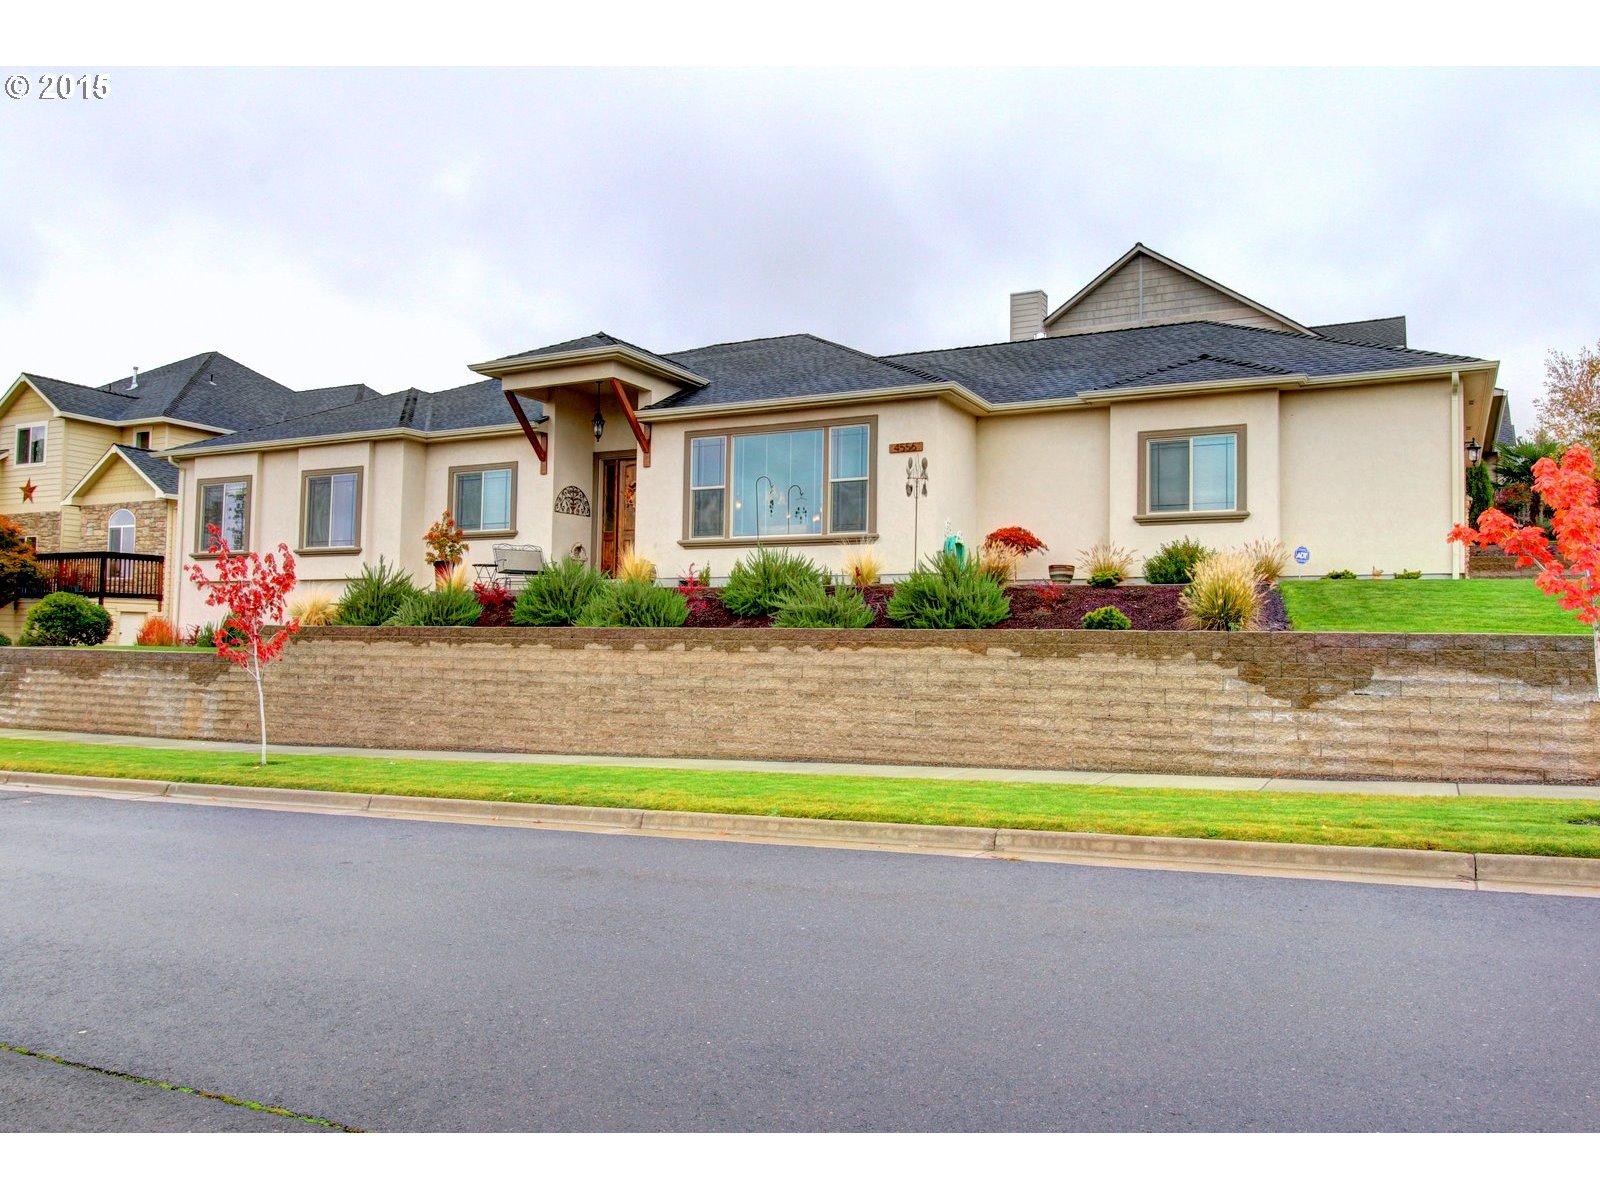 4556 Park Ridge Dr, Medford, OR